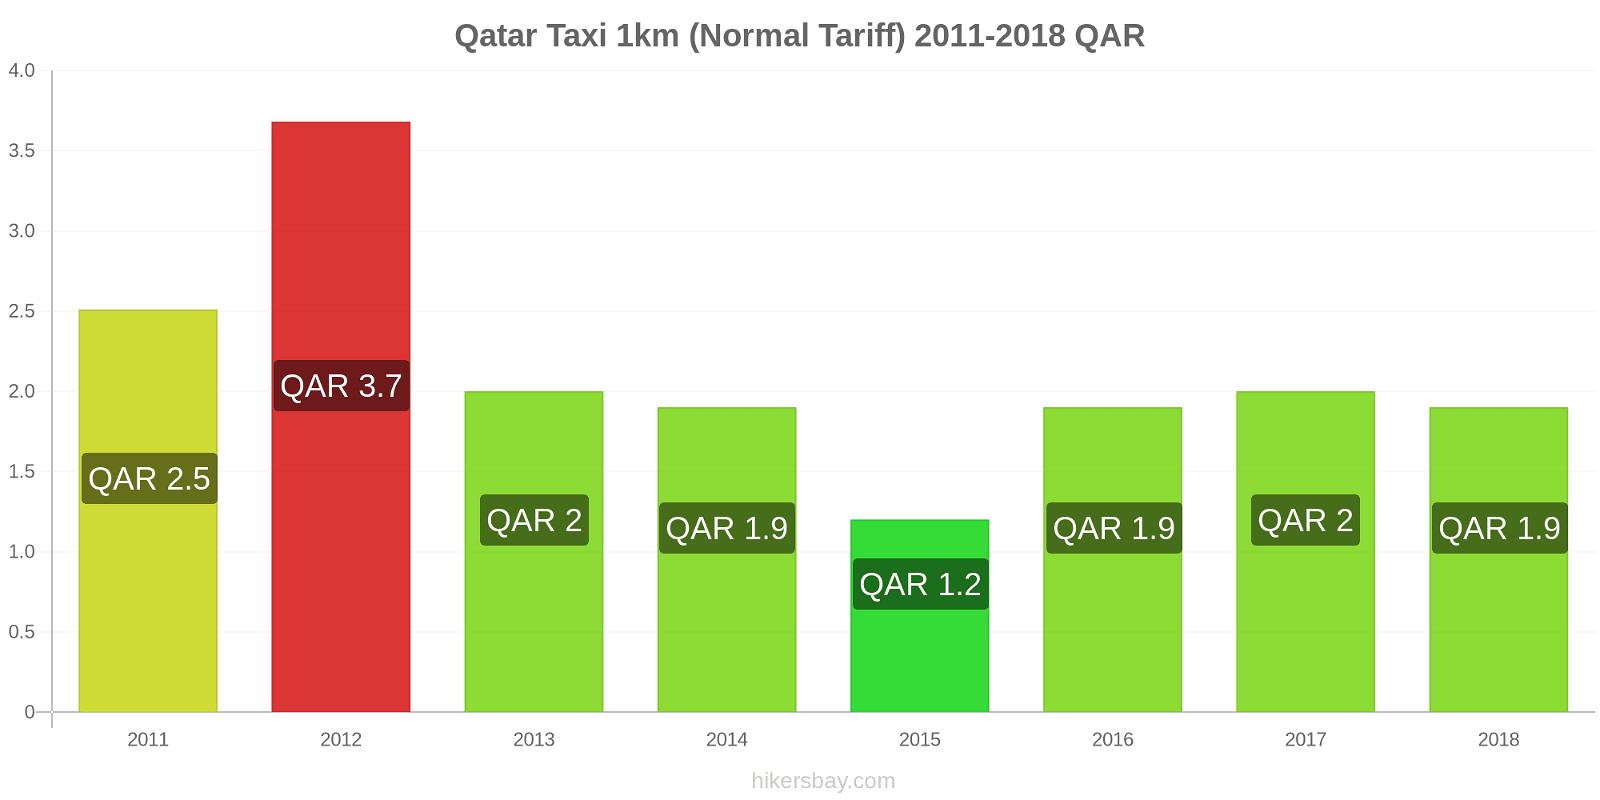 Qatar price changes Taxi 1km (Normal Tariff) hikersbay.com